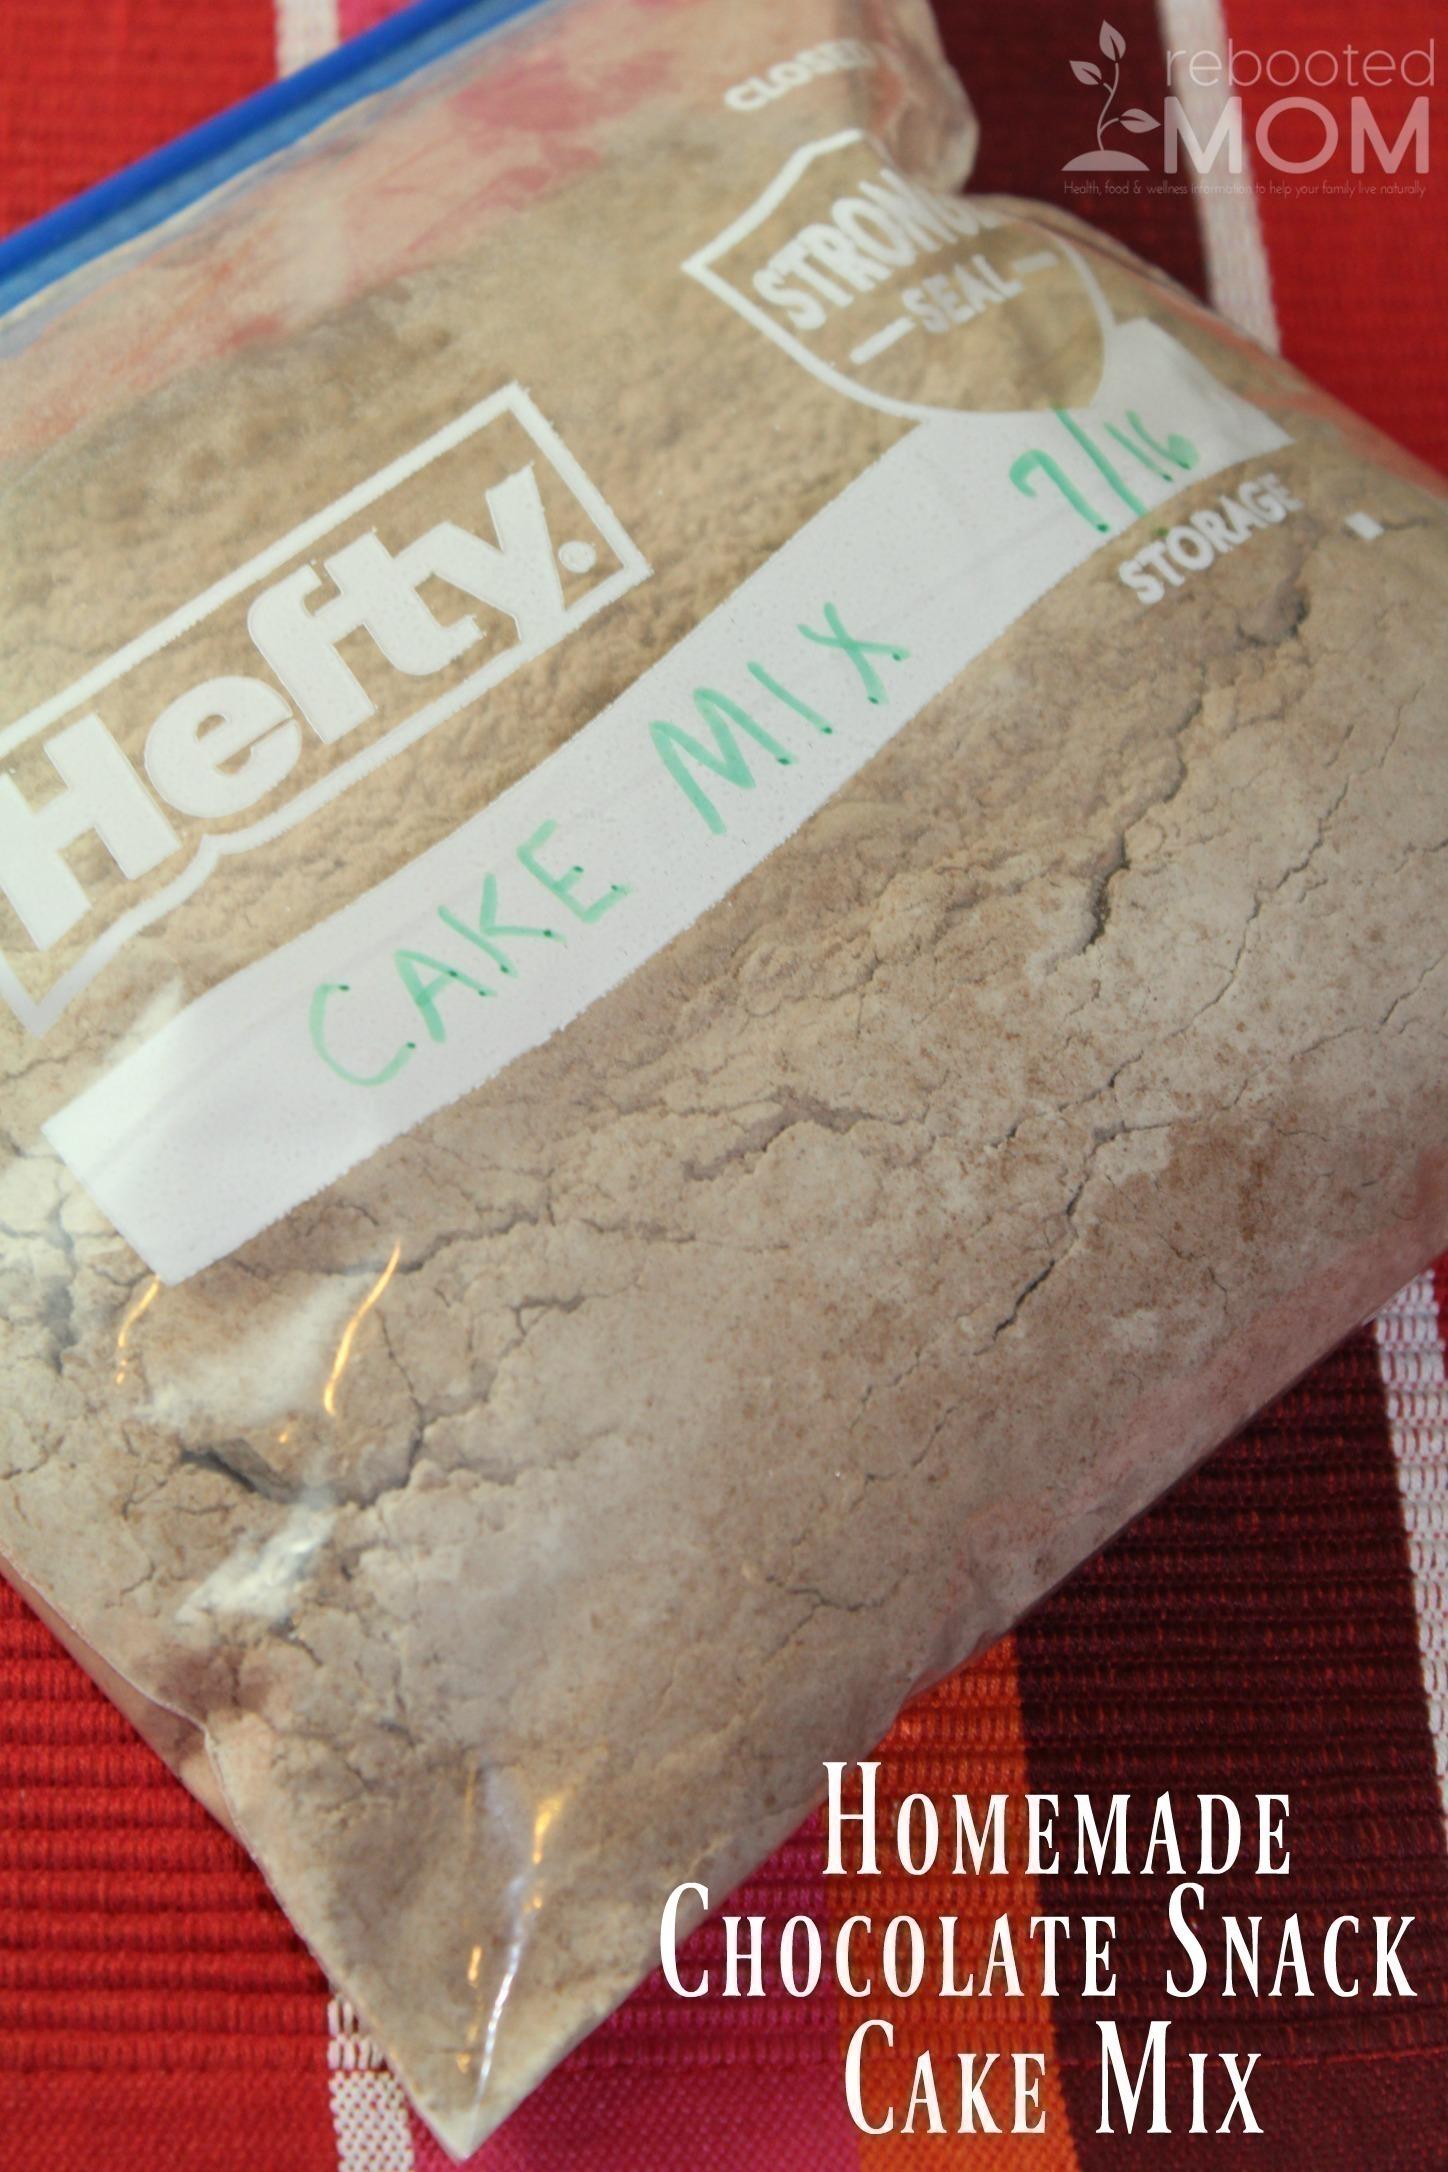 Homemade Chocolate Snack Cake Mix